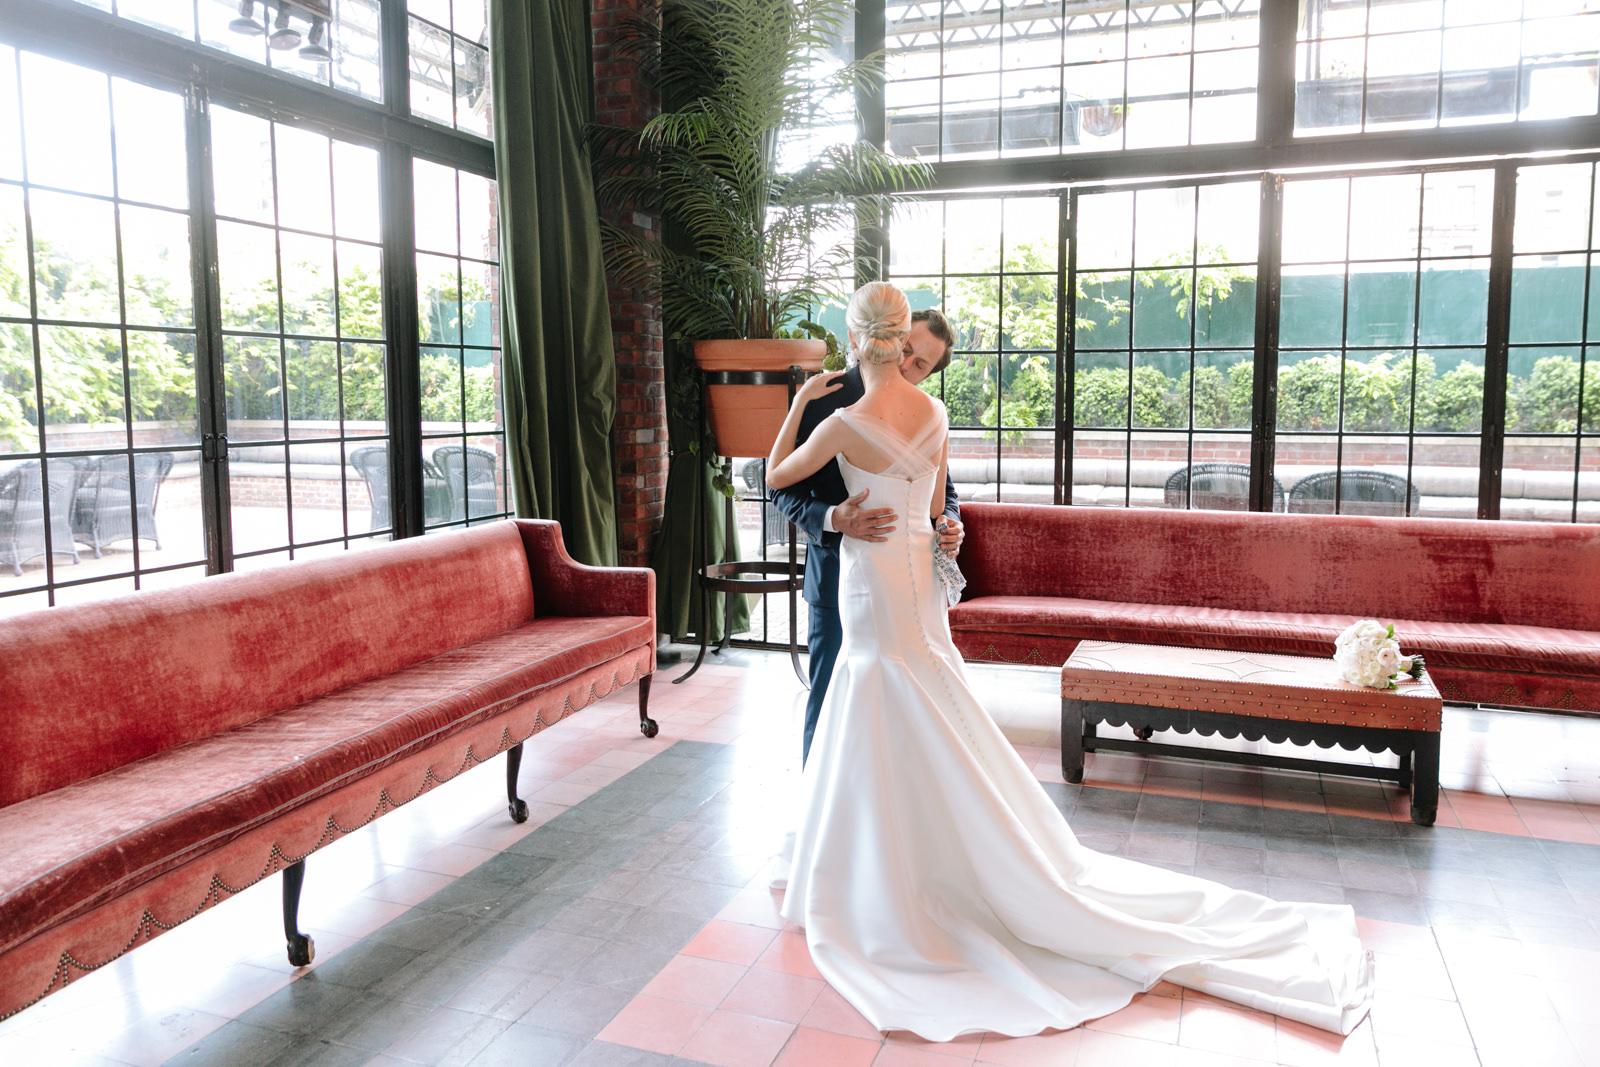 Intimate-NYC_wedding_ by Tanya Isaeva-71.jpg